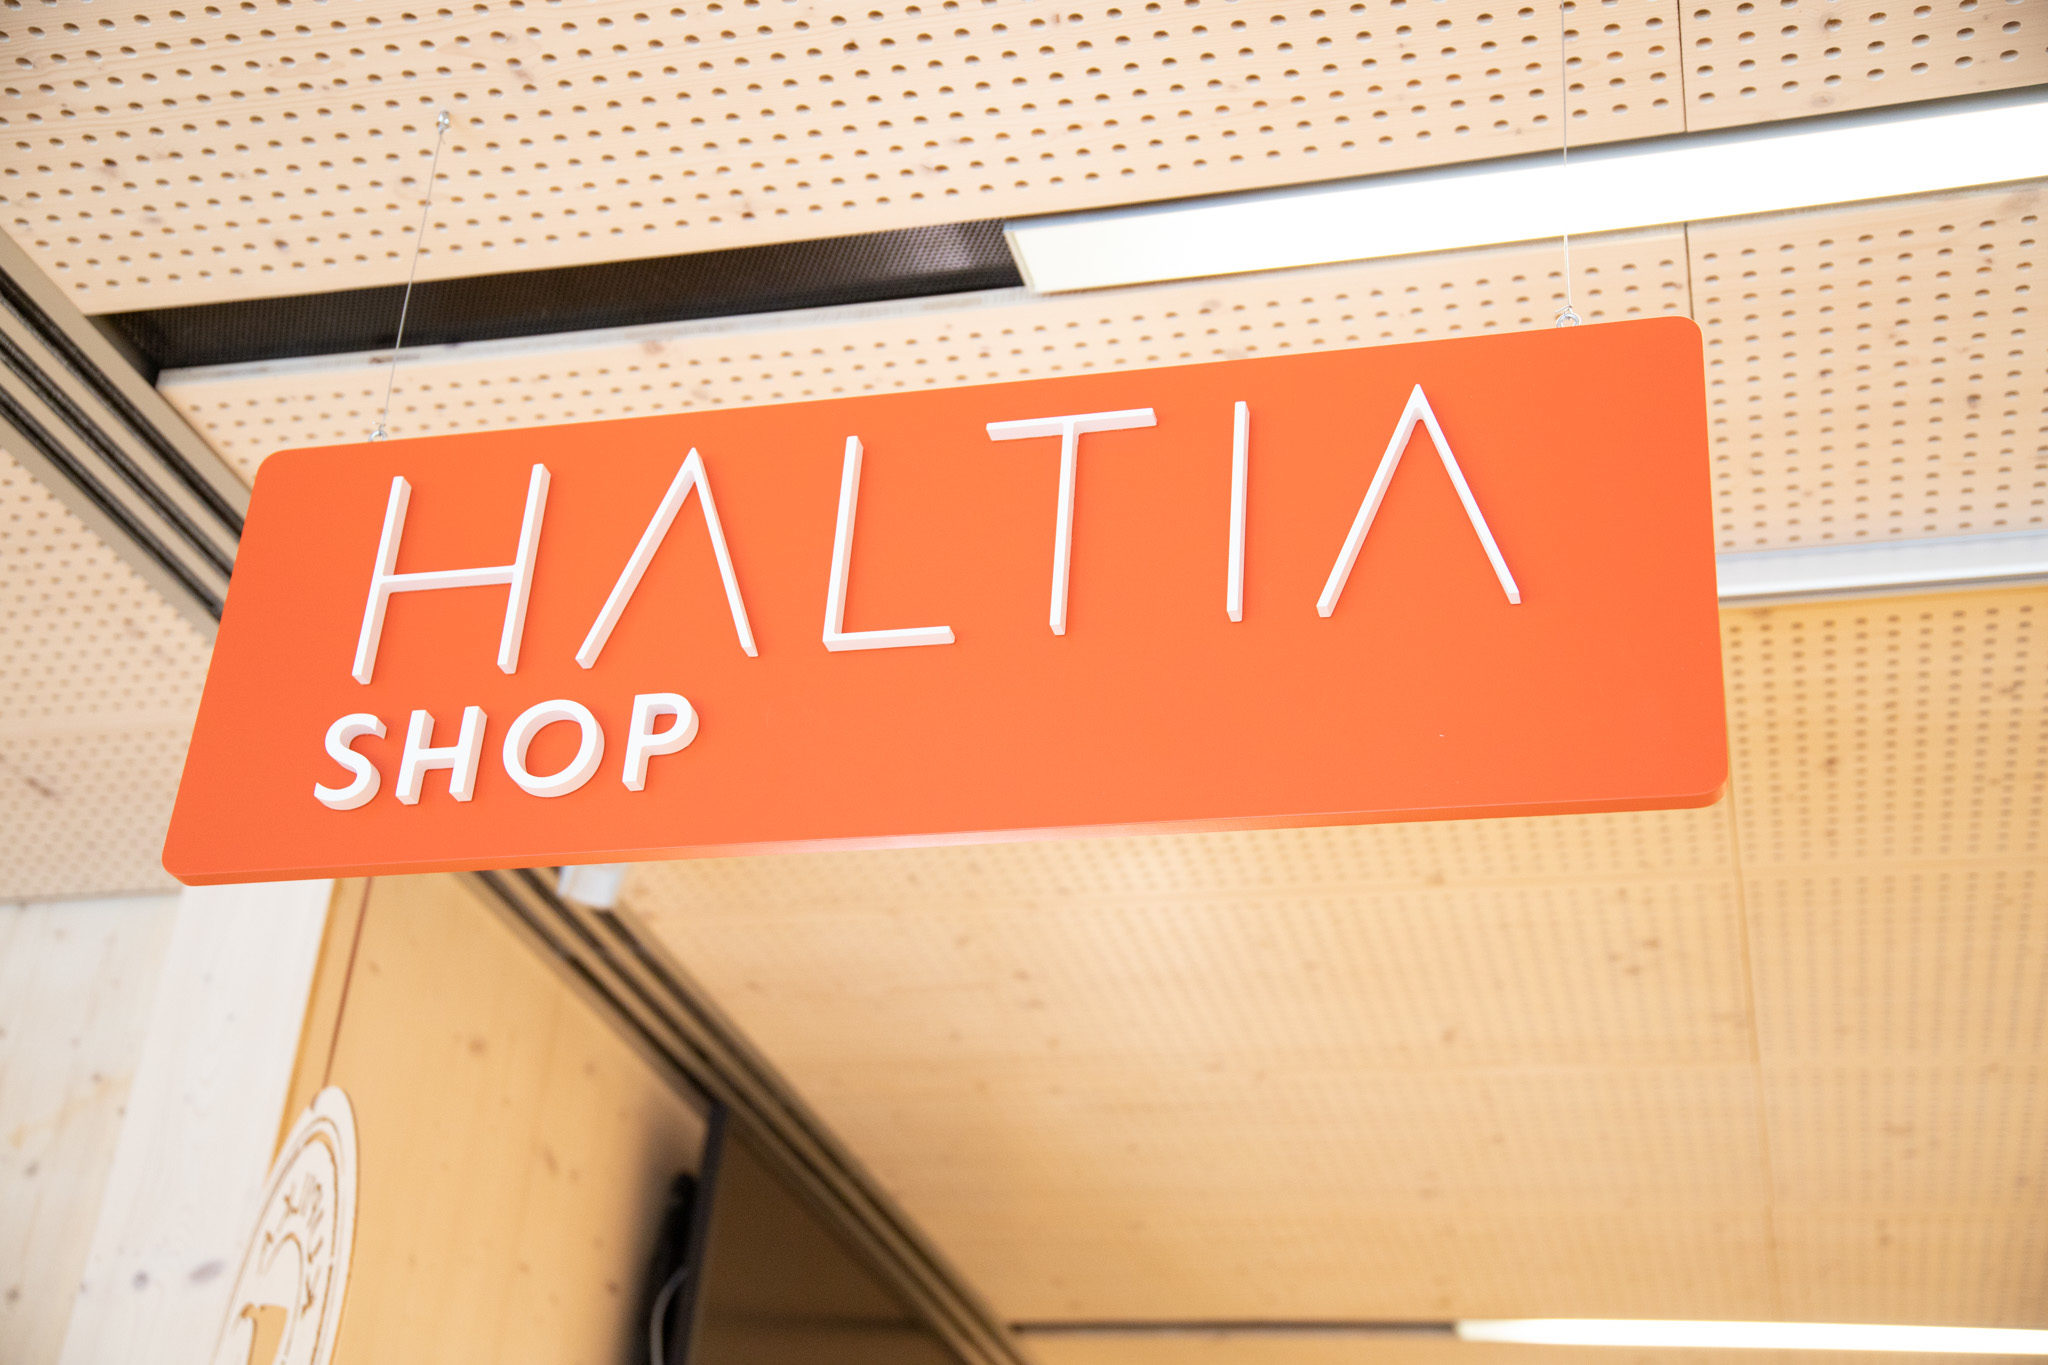 Haltia-products